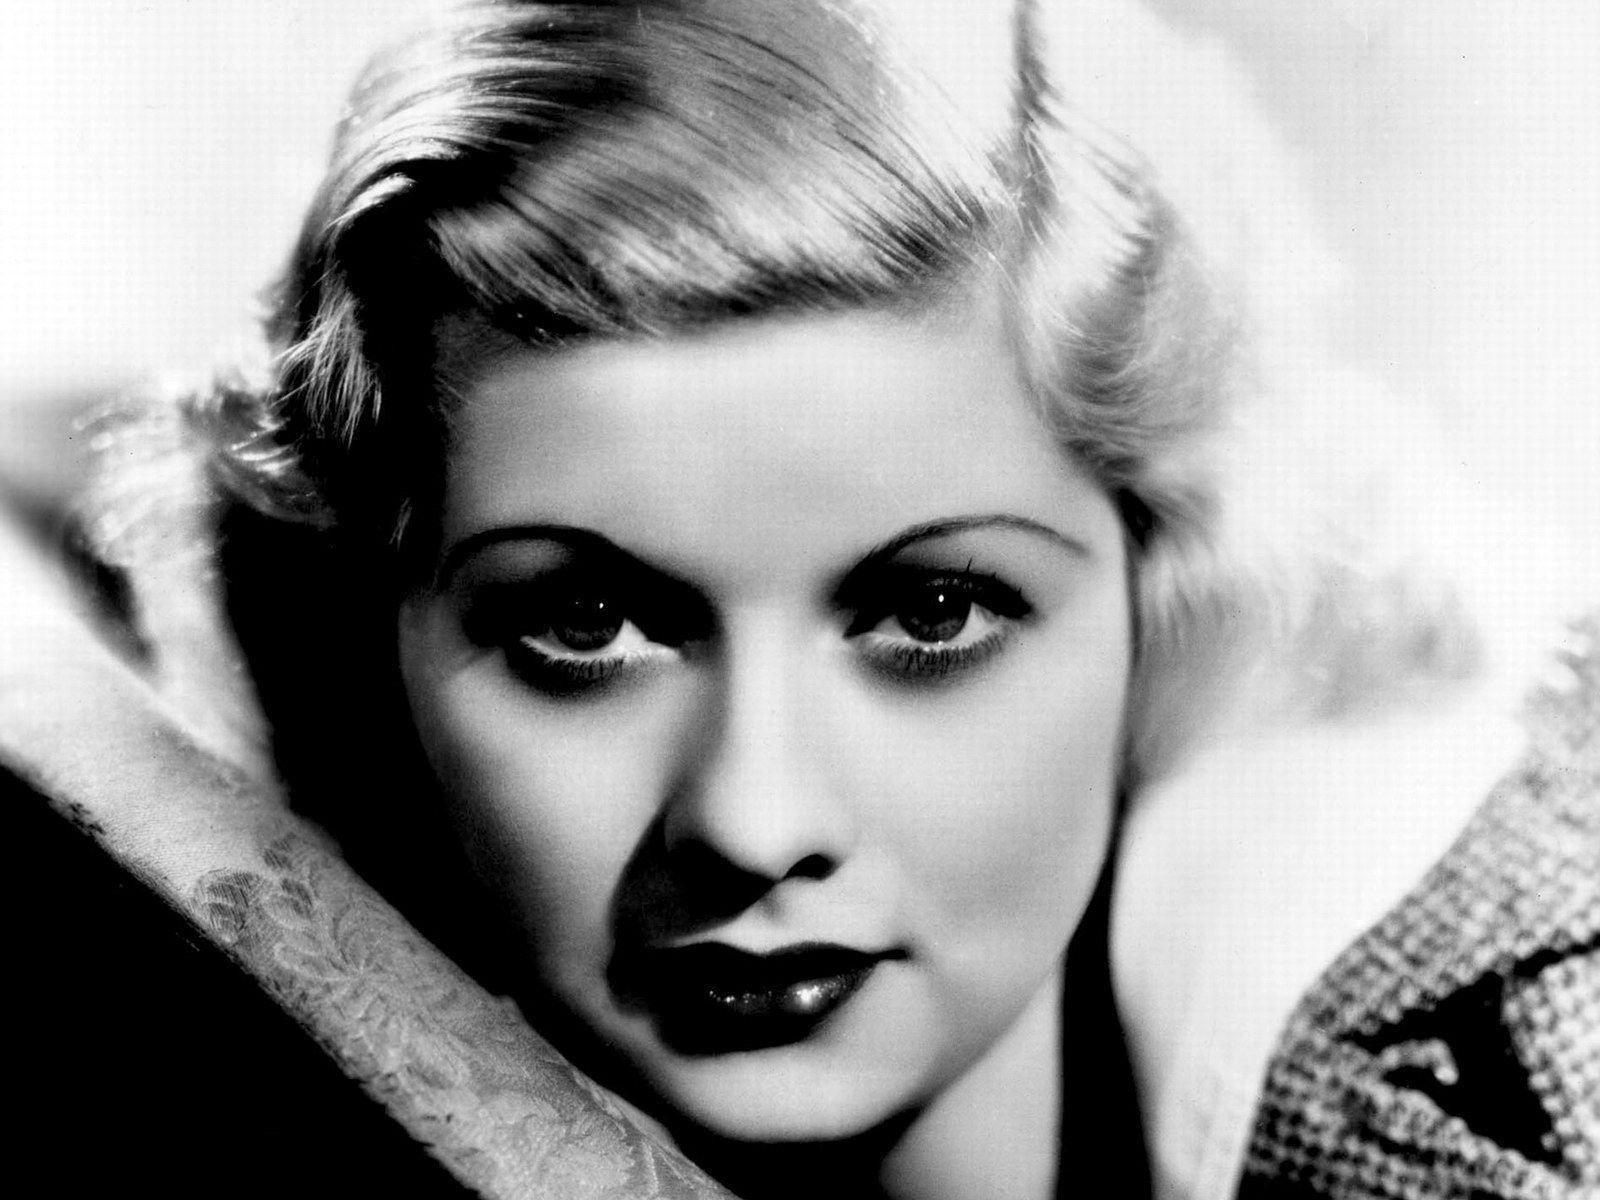 Download Wallpaper Lucille Ball Lucille Ball Actress Producer